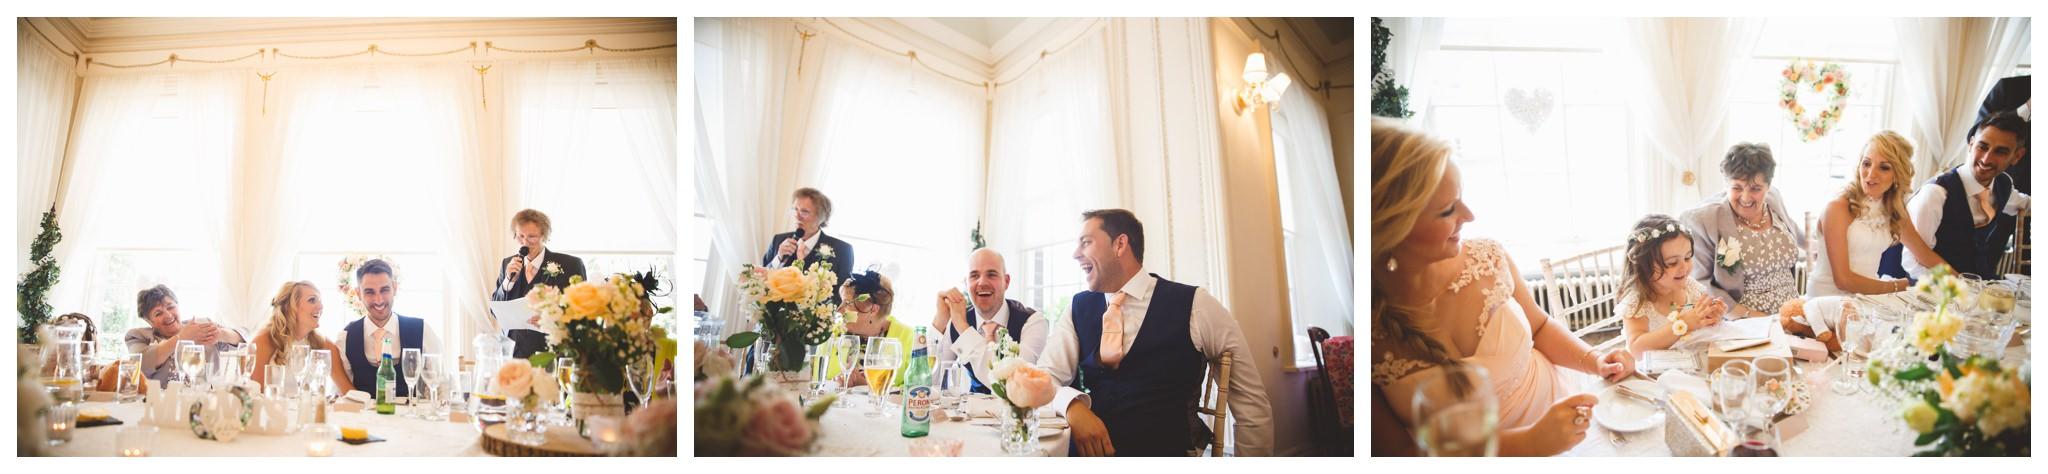 Richard Savage Photography - Wedding - Peterstone Court Brecon - 2016-05-11_0050